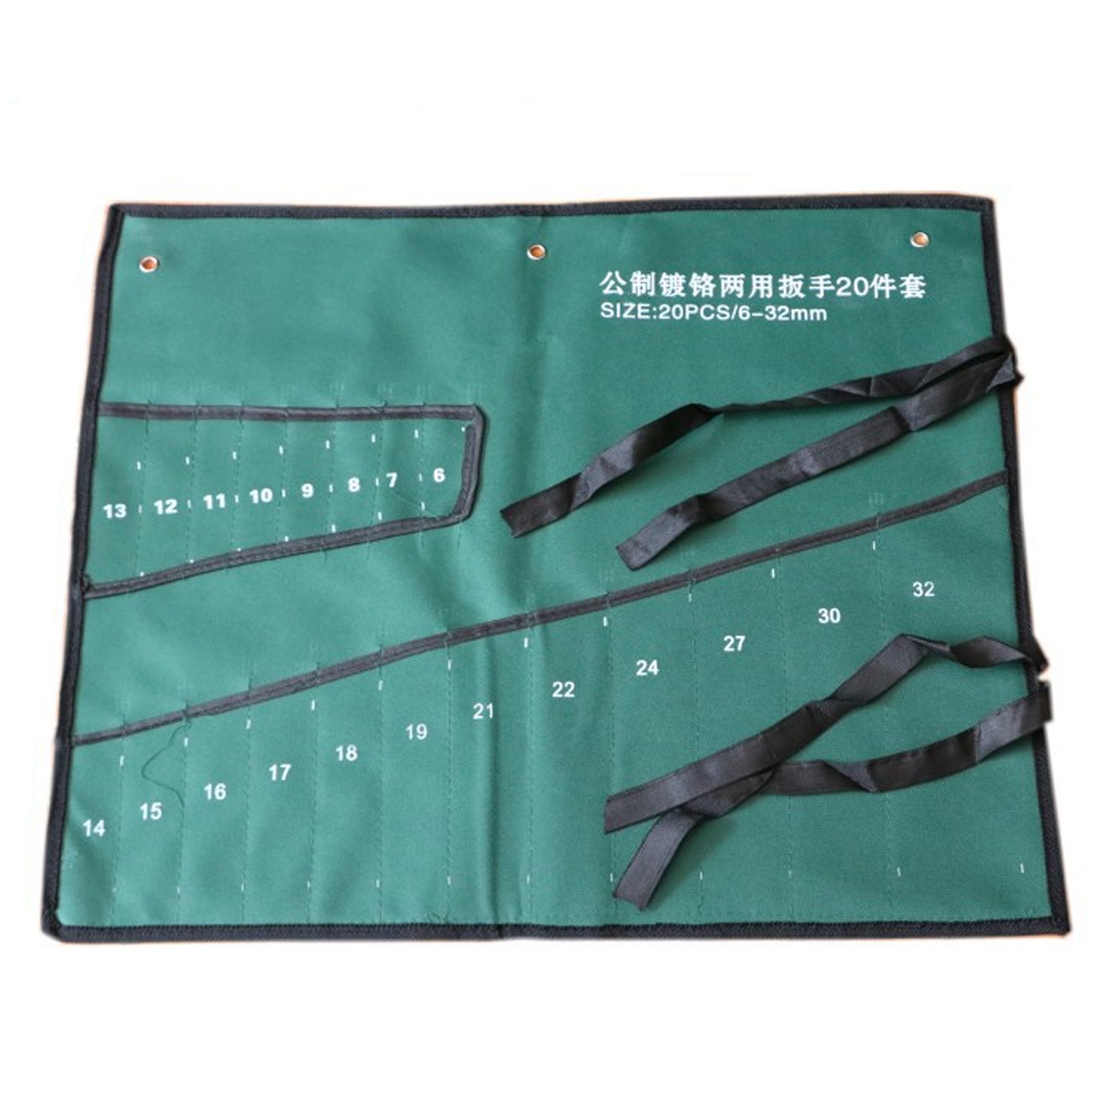 Hardware kit Ferramenta Caso Kit Saco Bolsos Duplo Deslocamento do Anel Chave de Abertura Chave de boca Arregaçar Saco Organizador De Armazenamento Bolsa